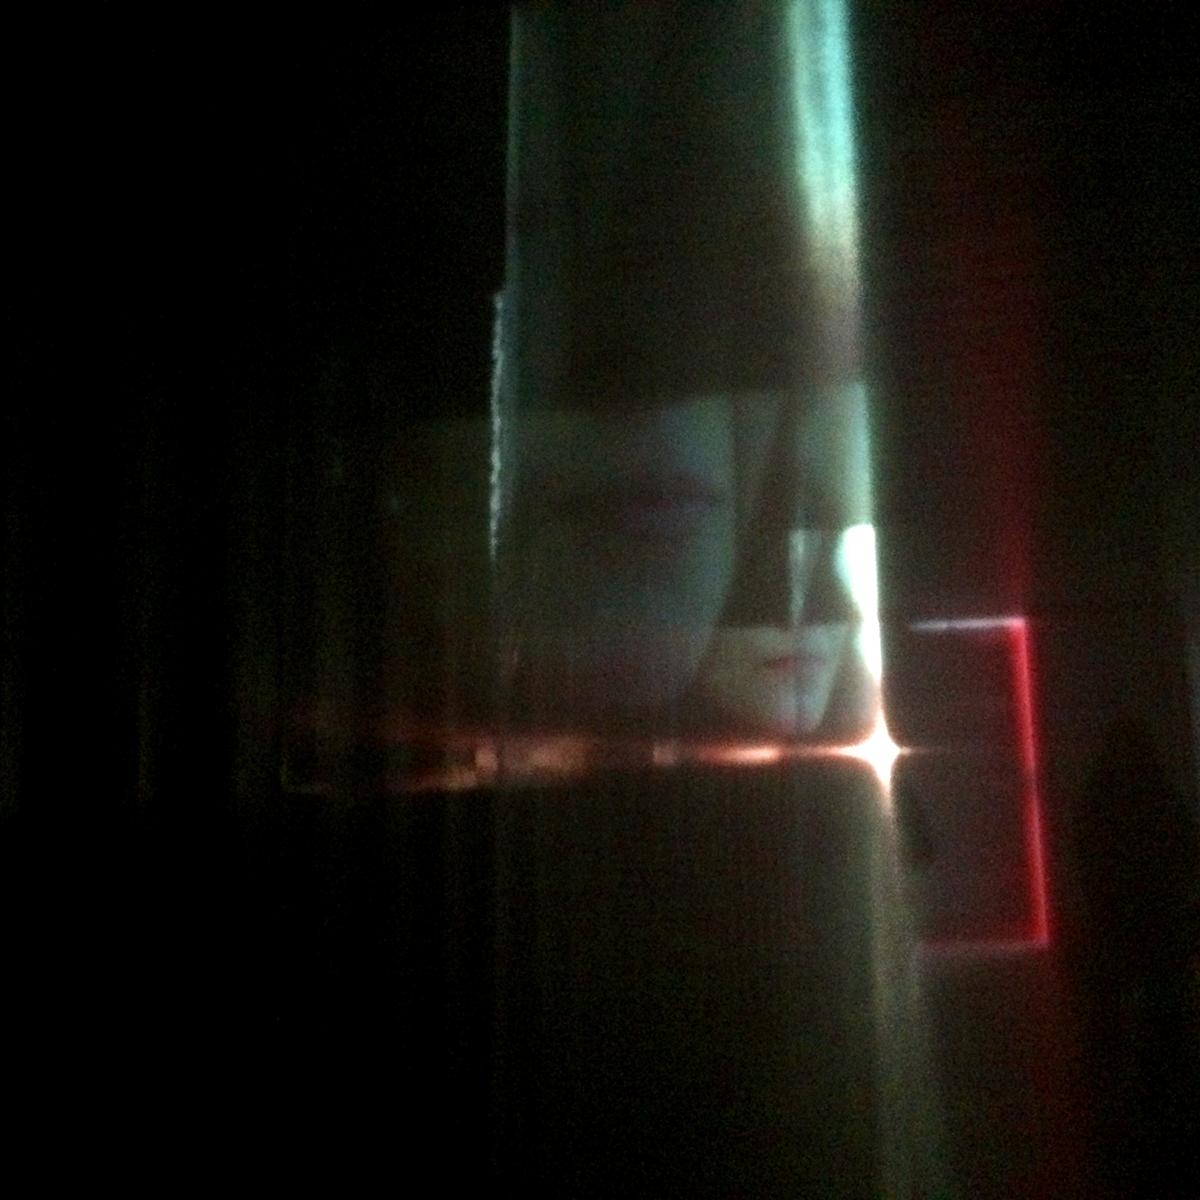 Francesi-Brooke_2014-Fall-CCA-Perceptual-Shifts_Installation-Photo-06.jpg